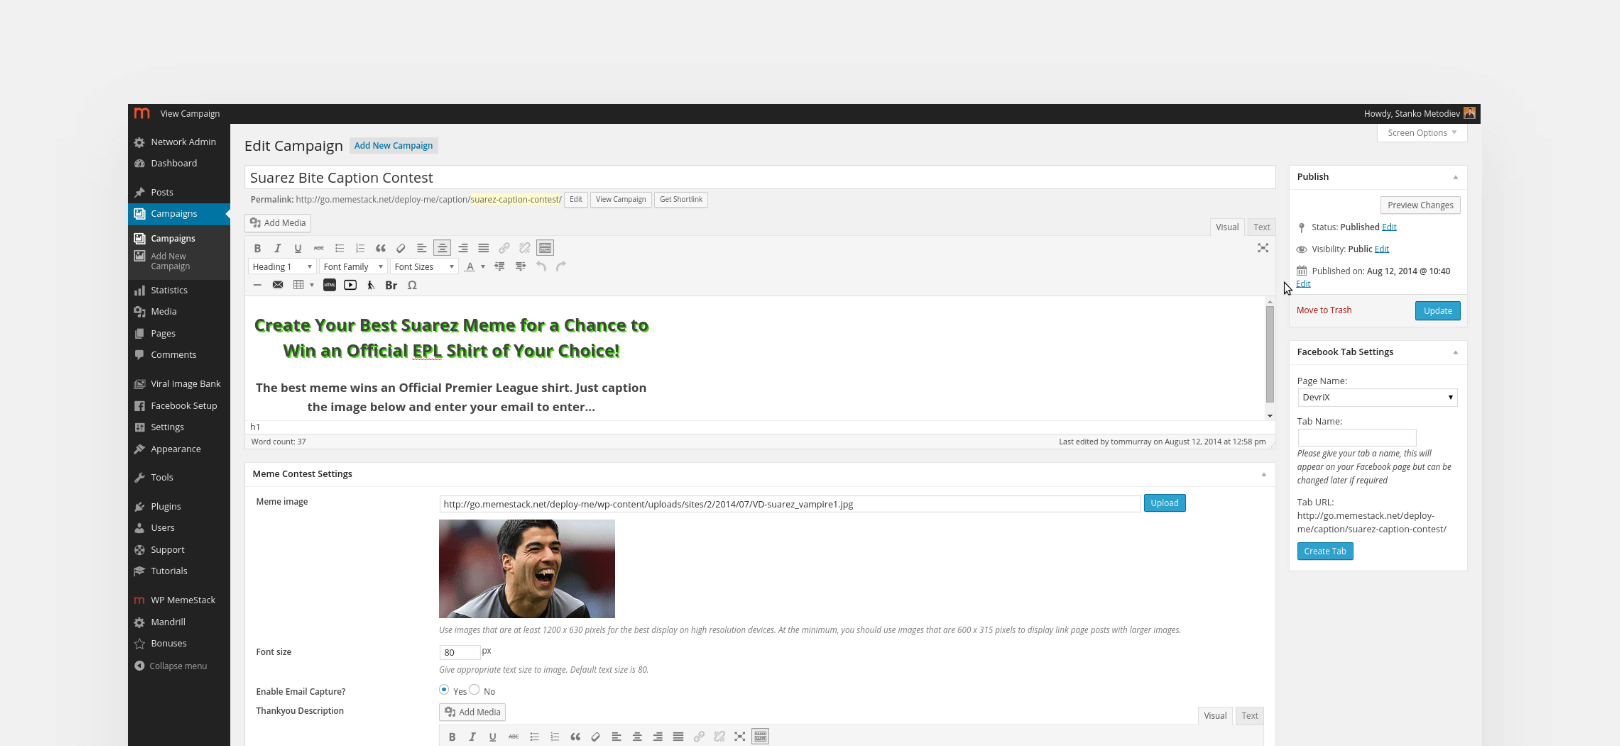 Edit campaign dashboard screenshot